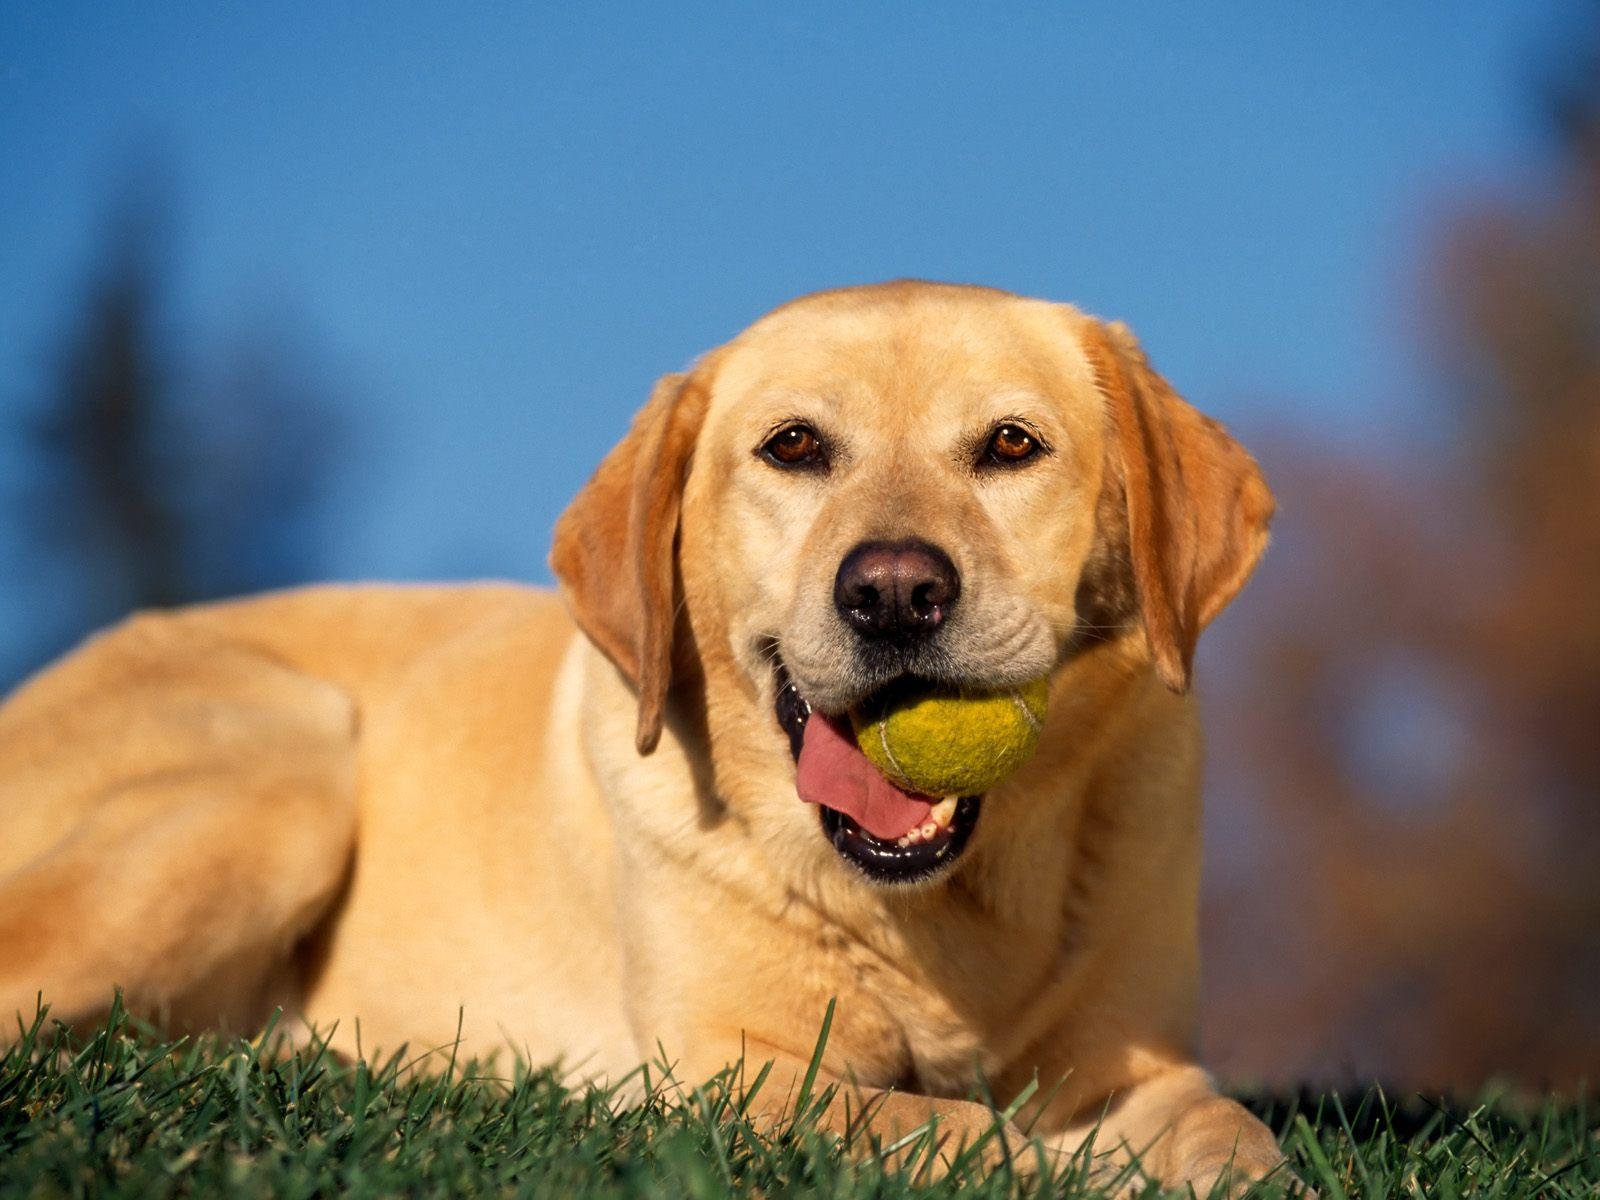 Wasp | Survivor Dogs fanfiction Wiki | FANDOM powered by Wikia